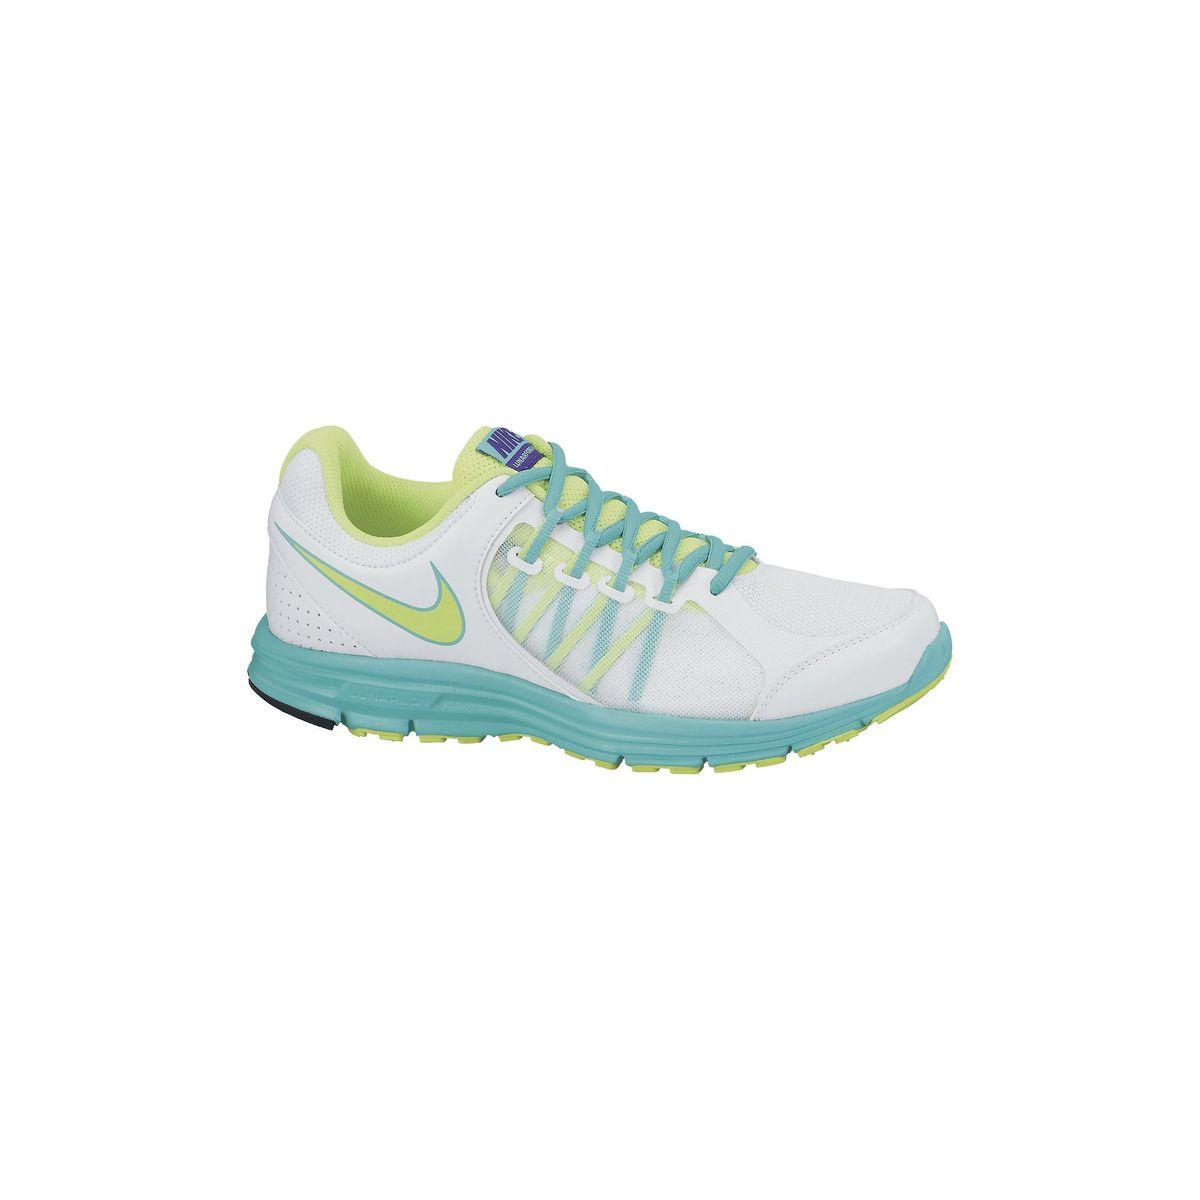 Nike Lunar Running Forever Shoes Ladies A5LR34j